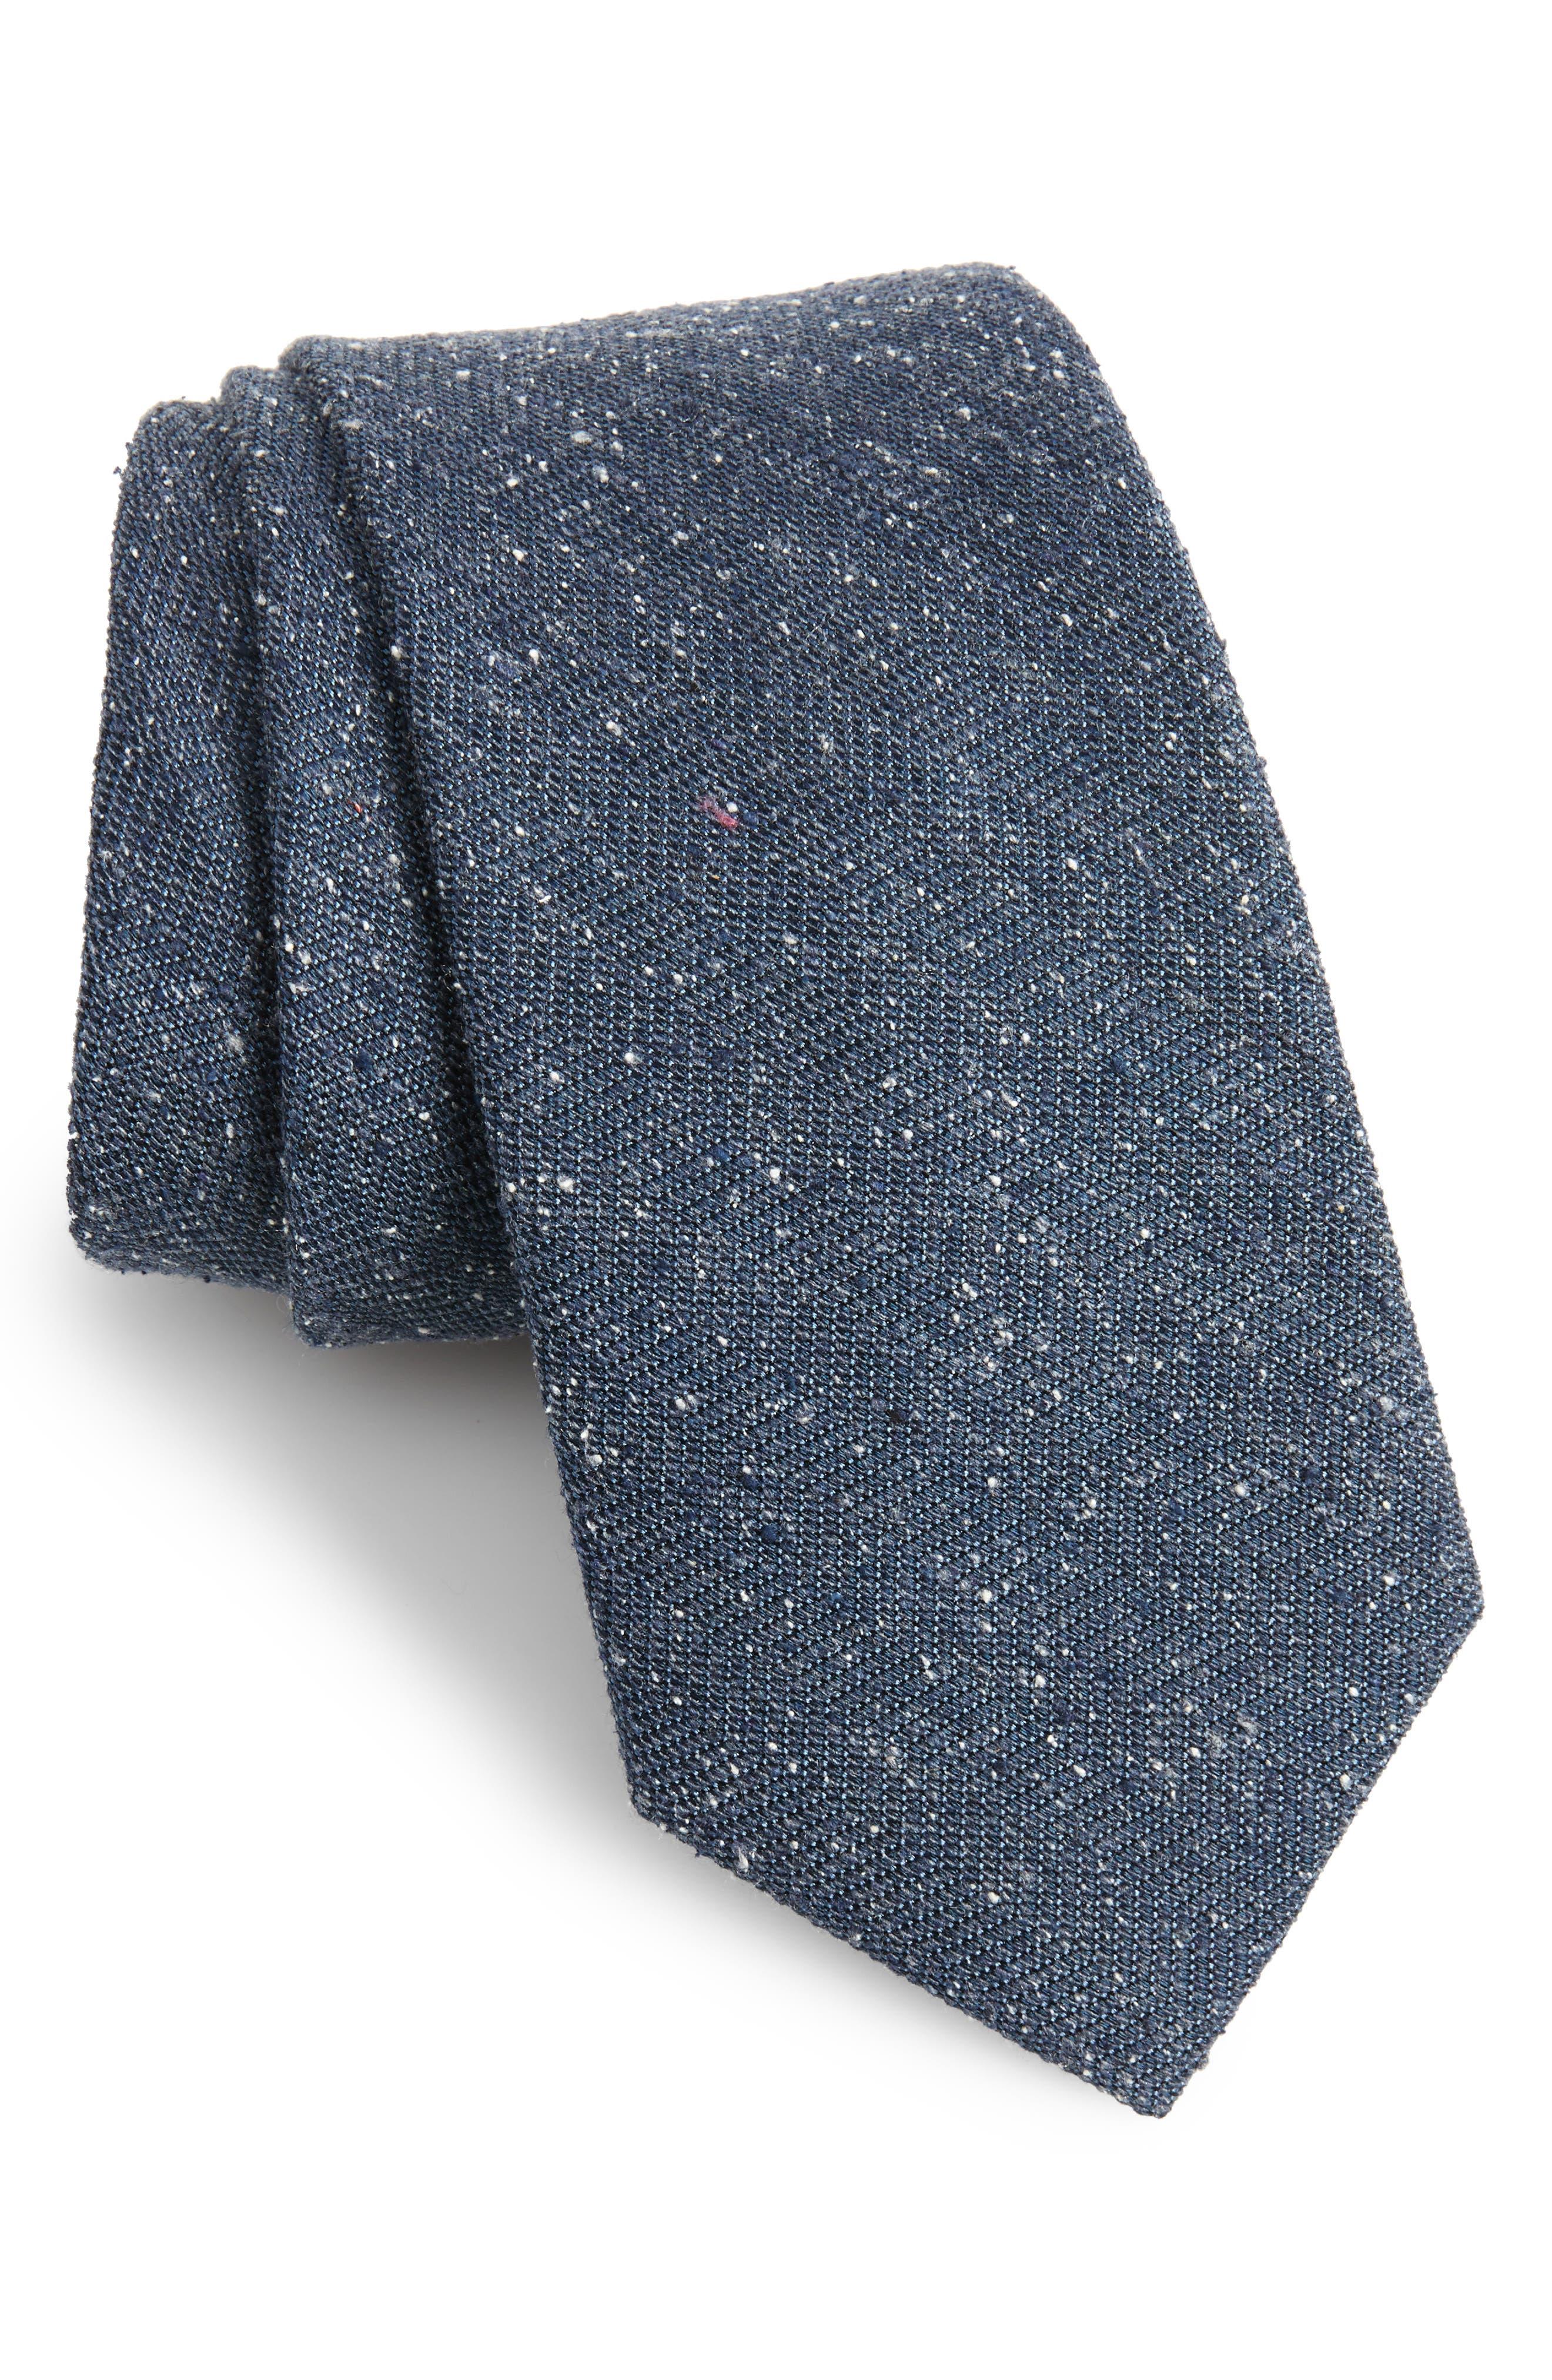 Main Image - The Tie Bar Herringbone Silk Tie (X-Long)